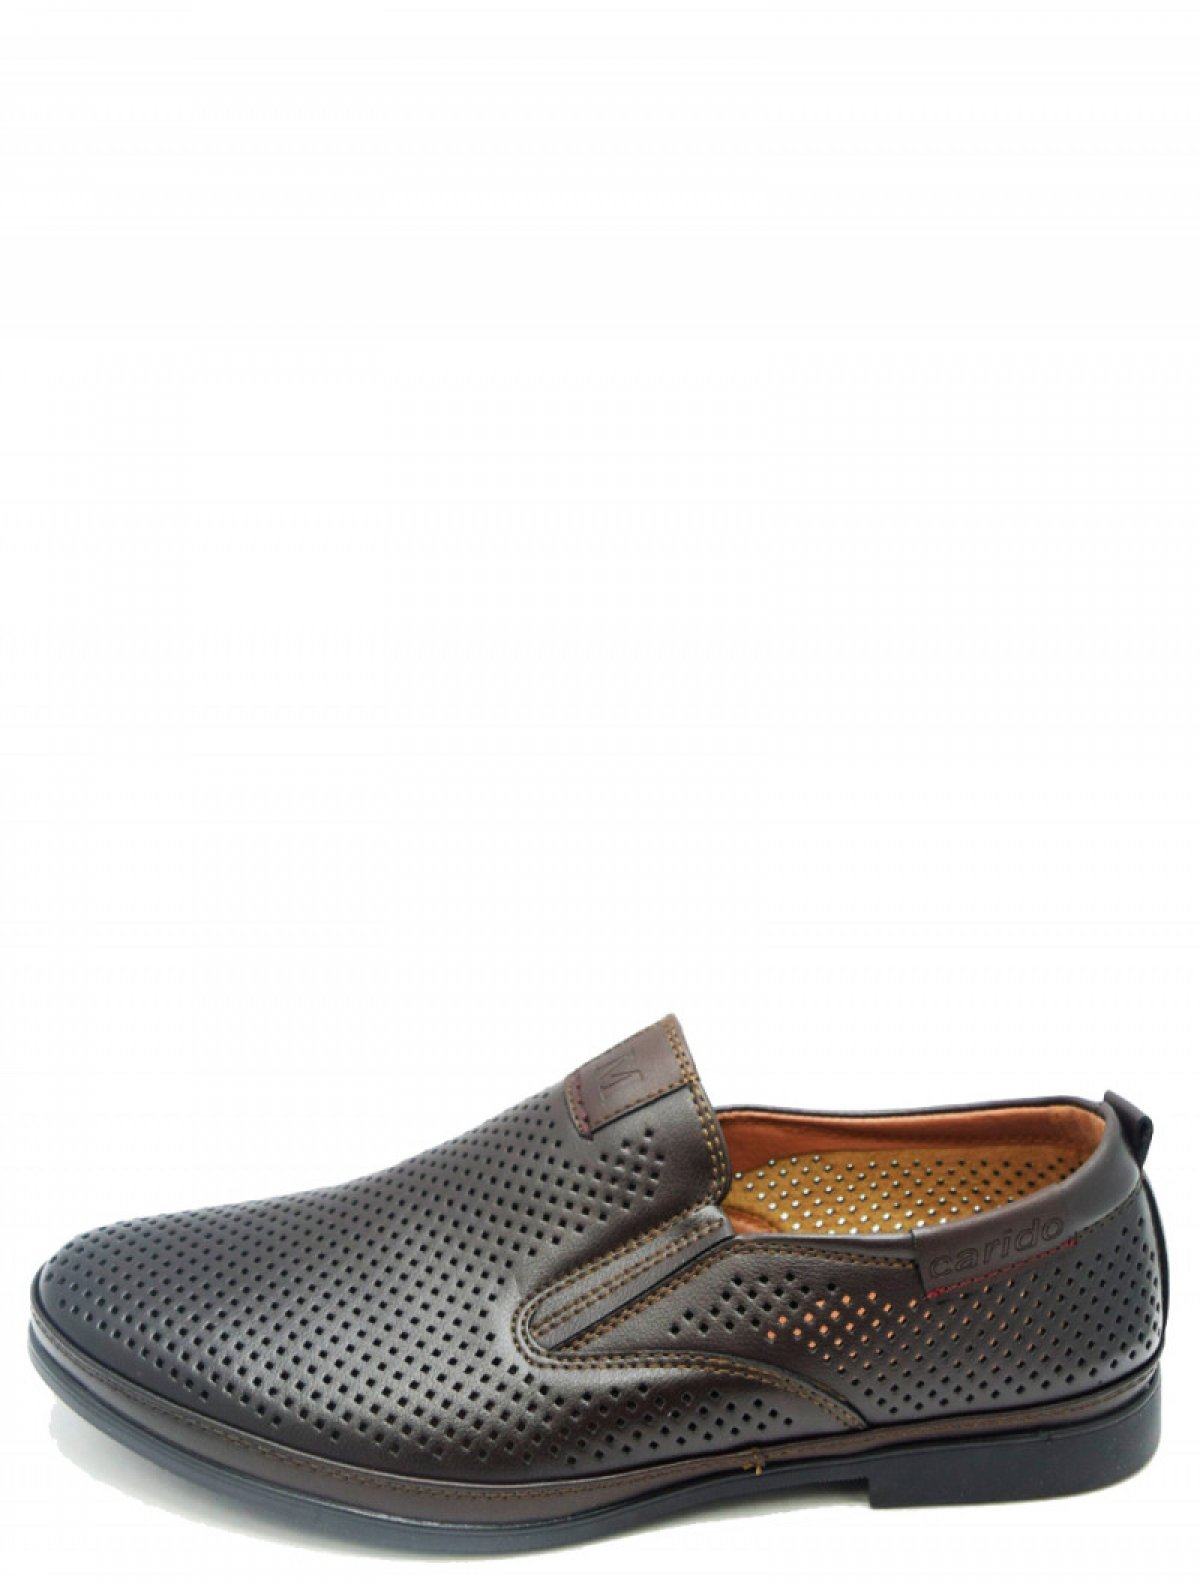 Carido P009-1N мужские туфли